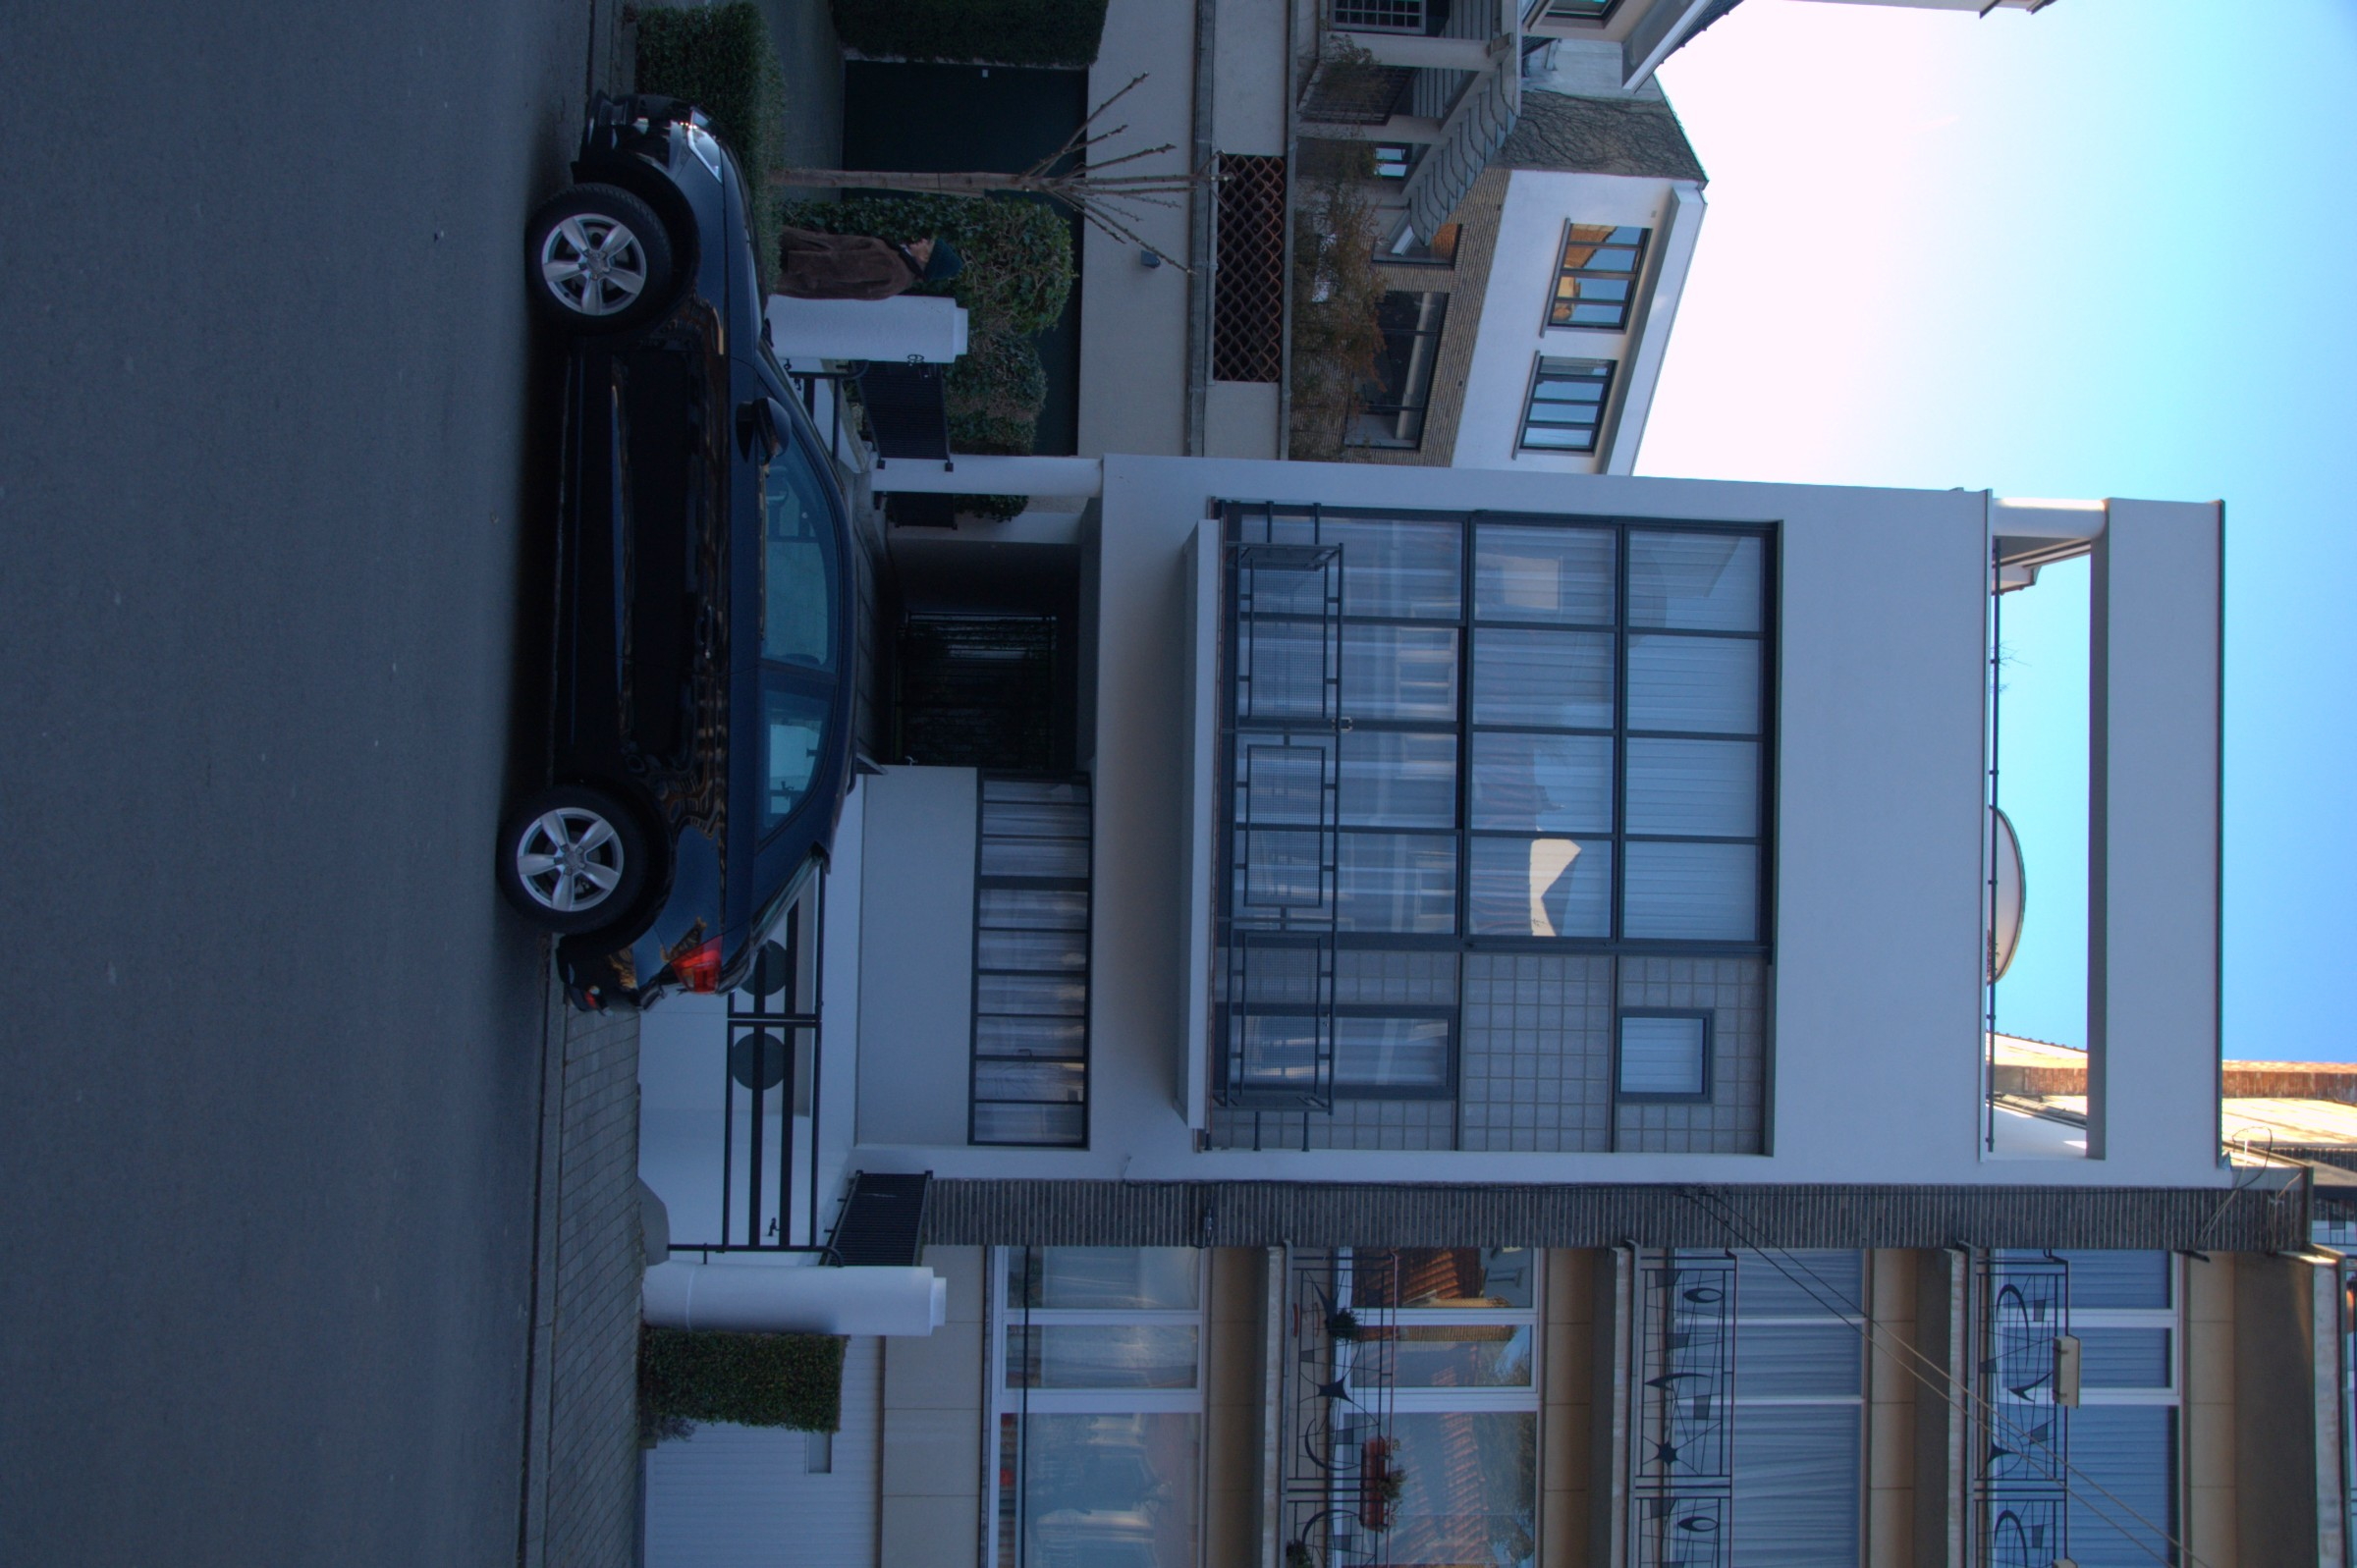 file la maison de verre rue jules lejeune wikimedia commons. Black Bedroom Furniture Sets. Home Design Ideas